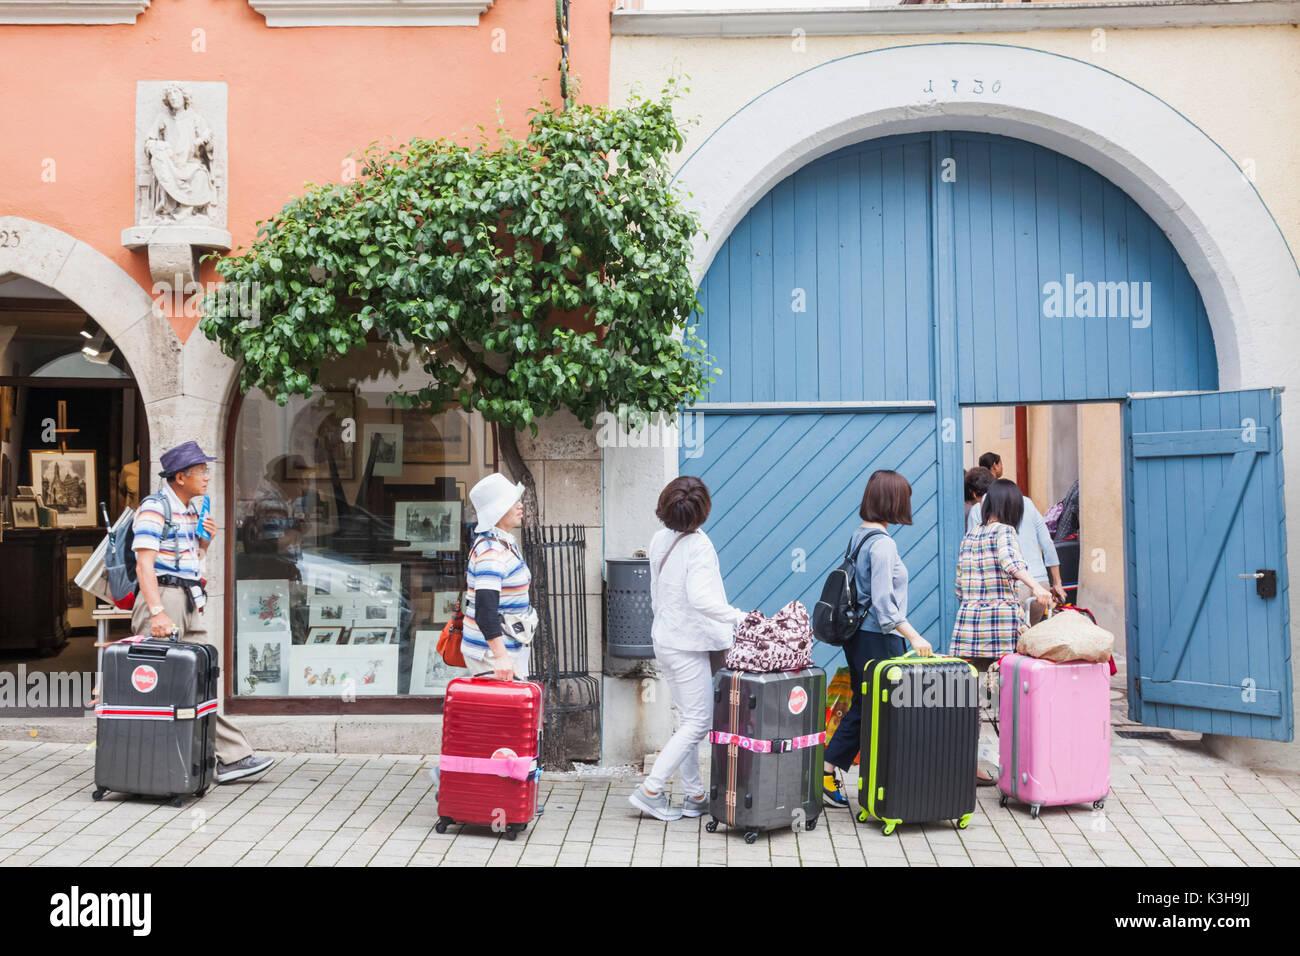 Germany, Bavaria, Romantic Road, Rothenburg-ob-der-Tauber, Asian Tourists Arriving Through Hotel Back Door - Stock Image